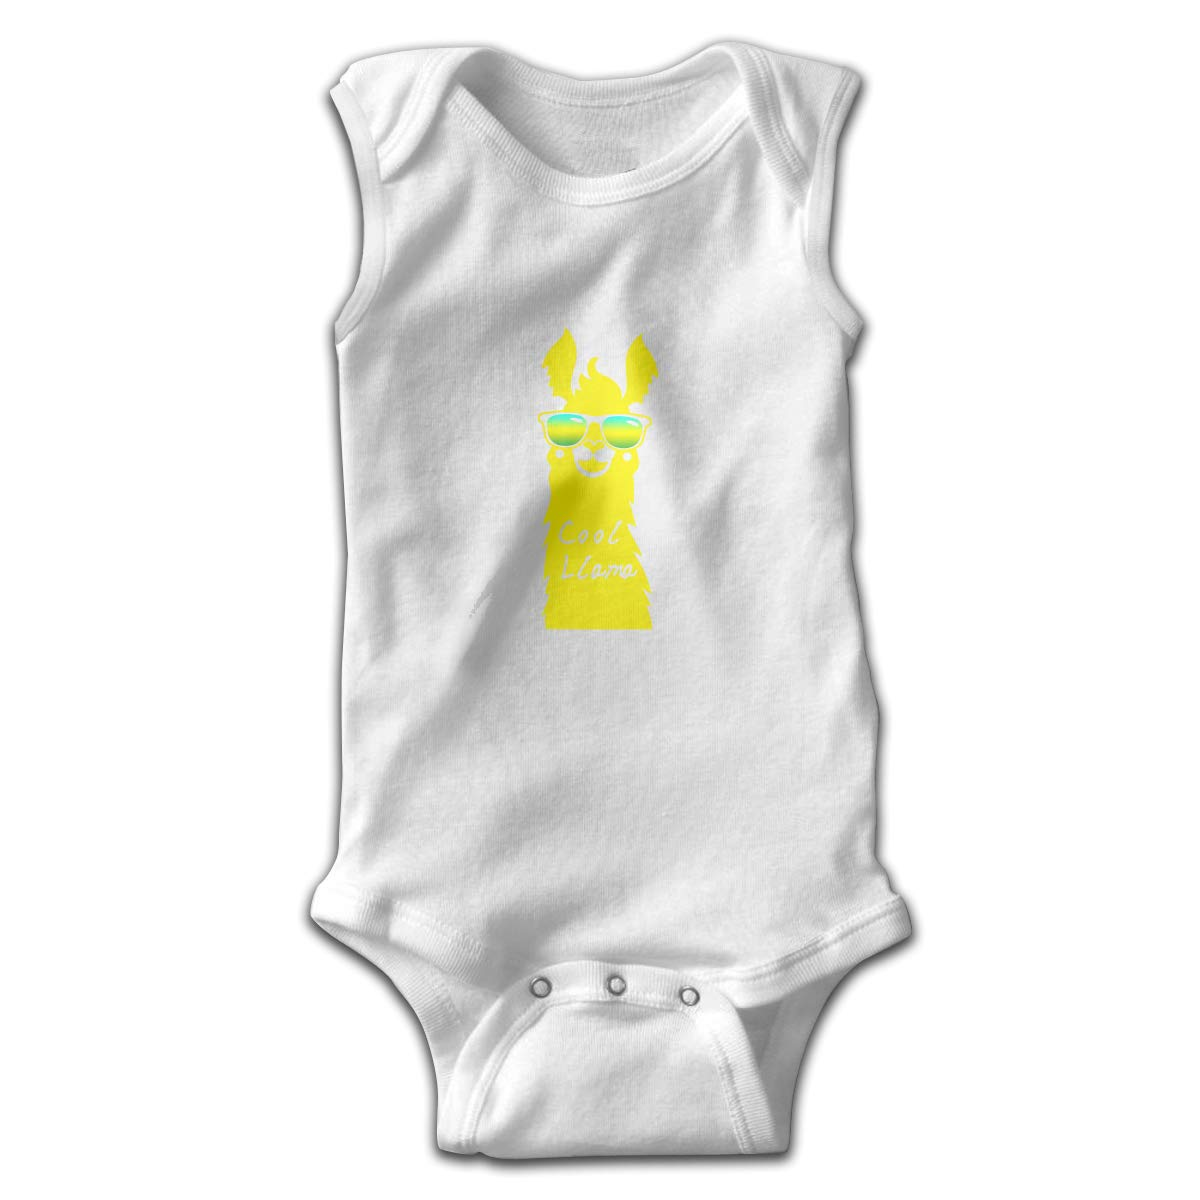 Dunpaiaa Cool Llama with Sunglass Newborn Crawling Suit Sleeveless Romper Bodysuit Onesies Jumpsuit Black